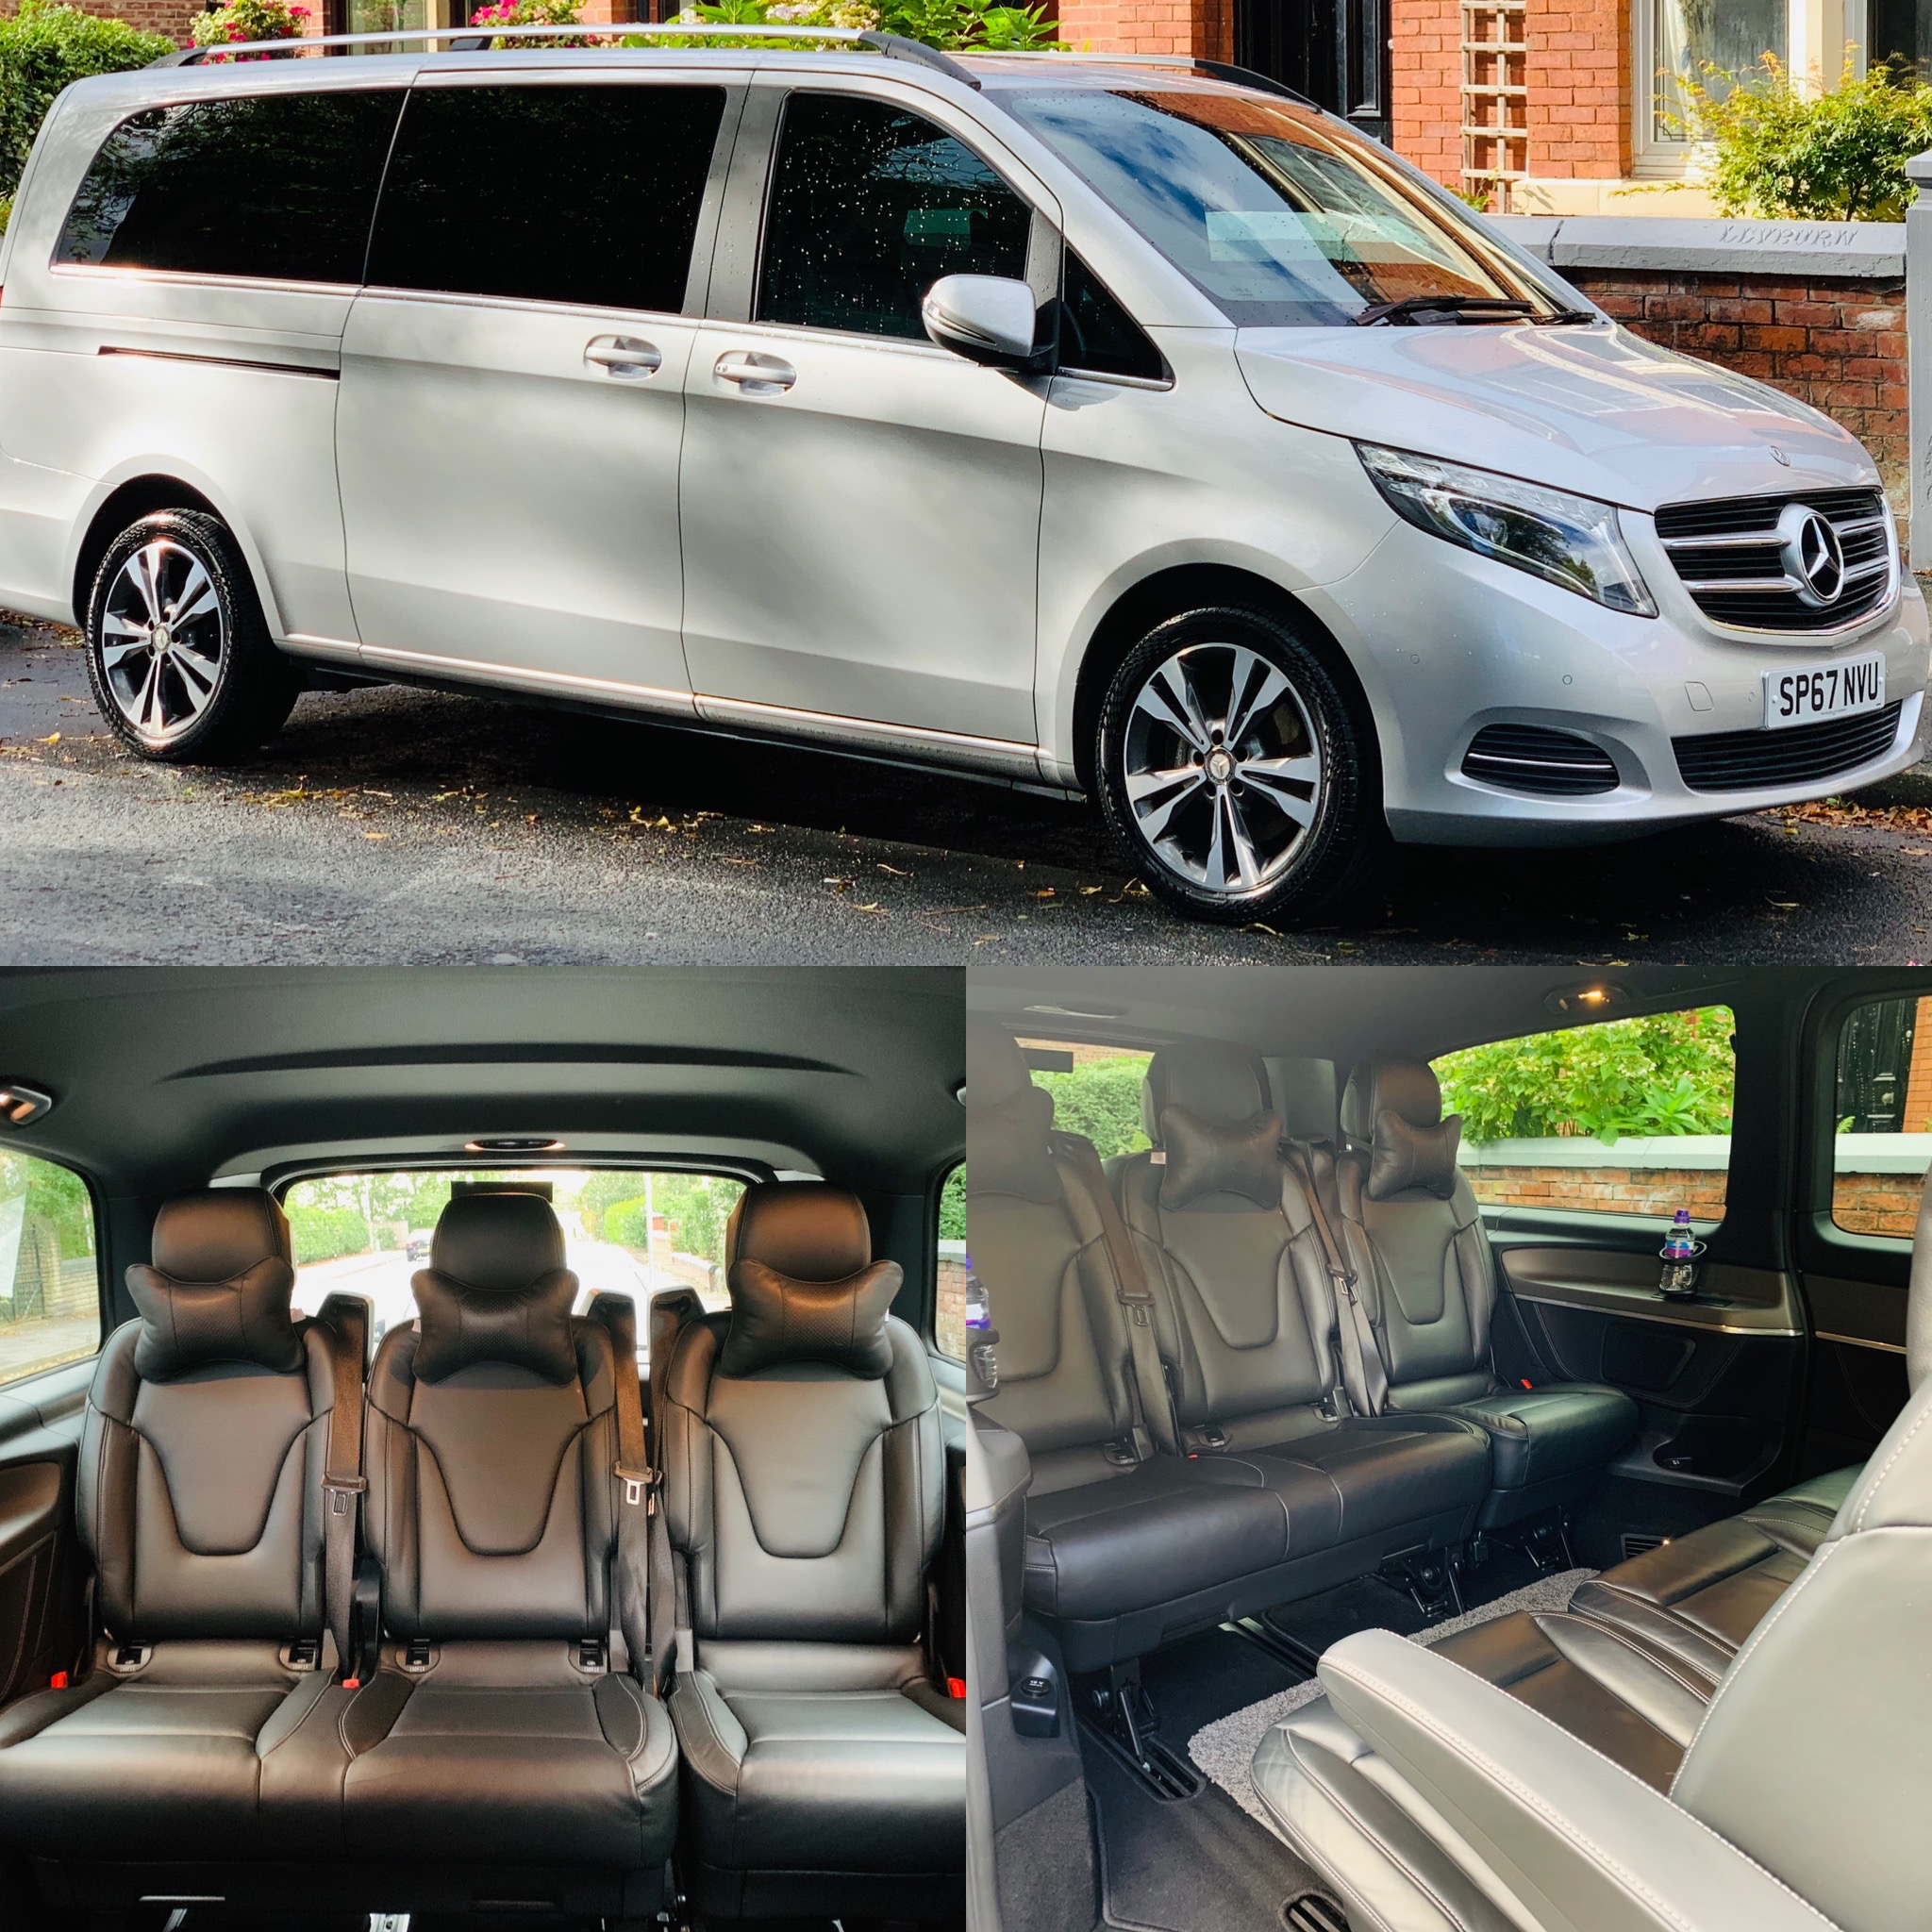 Luxury Chauffeur Service Manchester